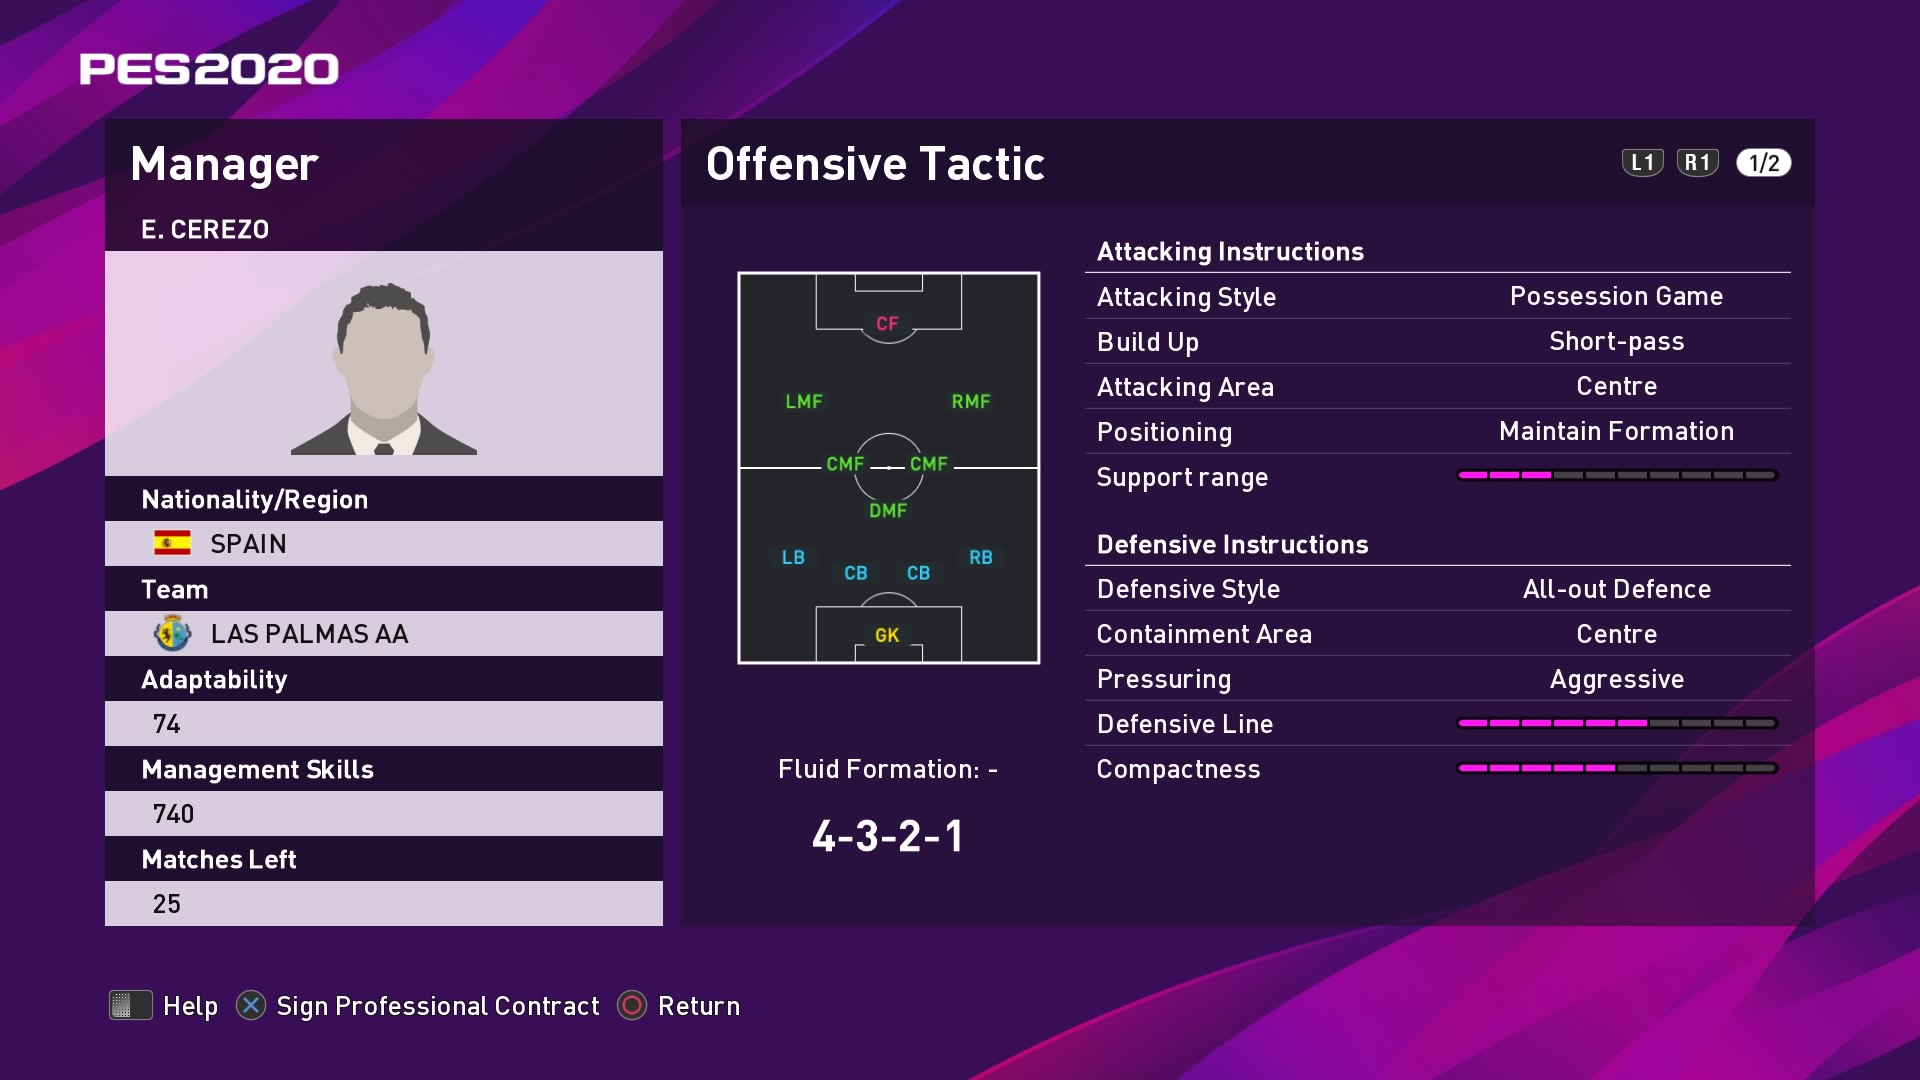 E. Cerezo (Pepe Mel) Offensive Tactic in PES 2020 myClub